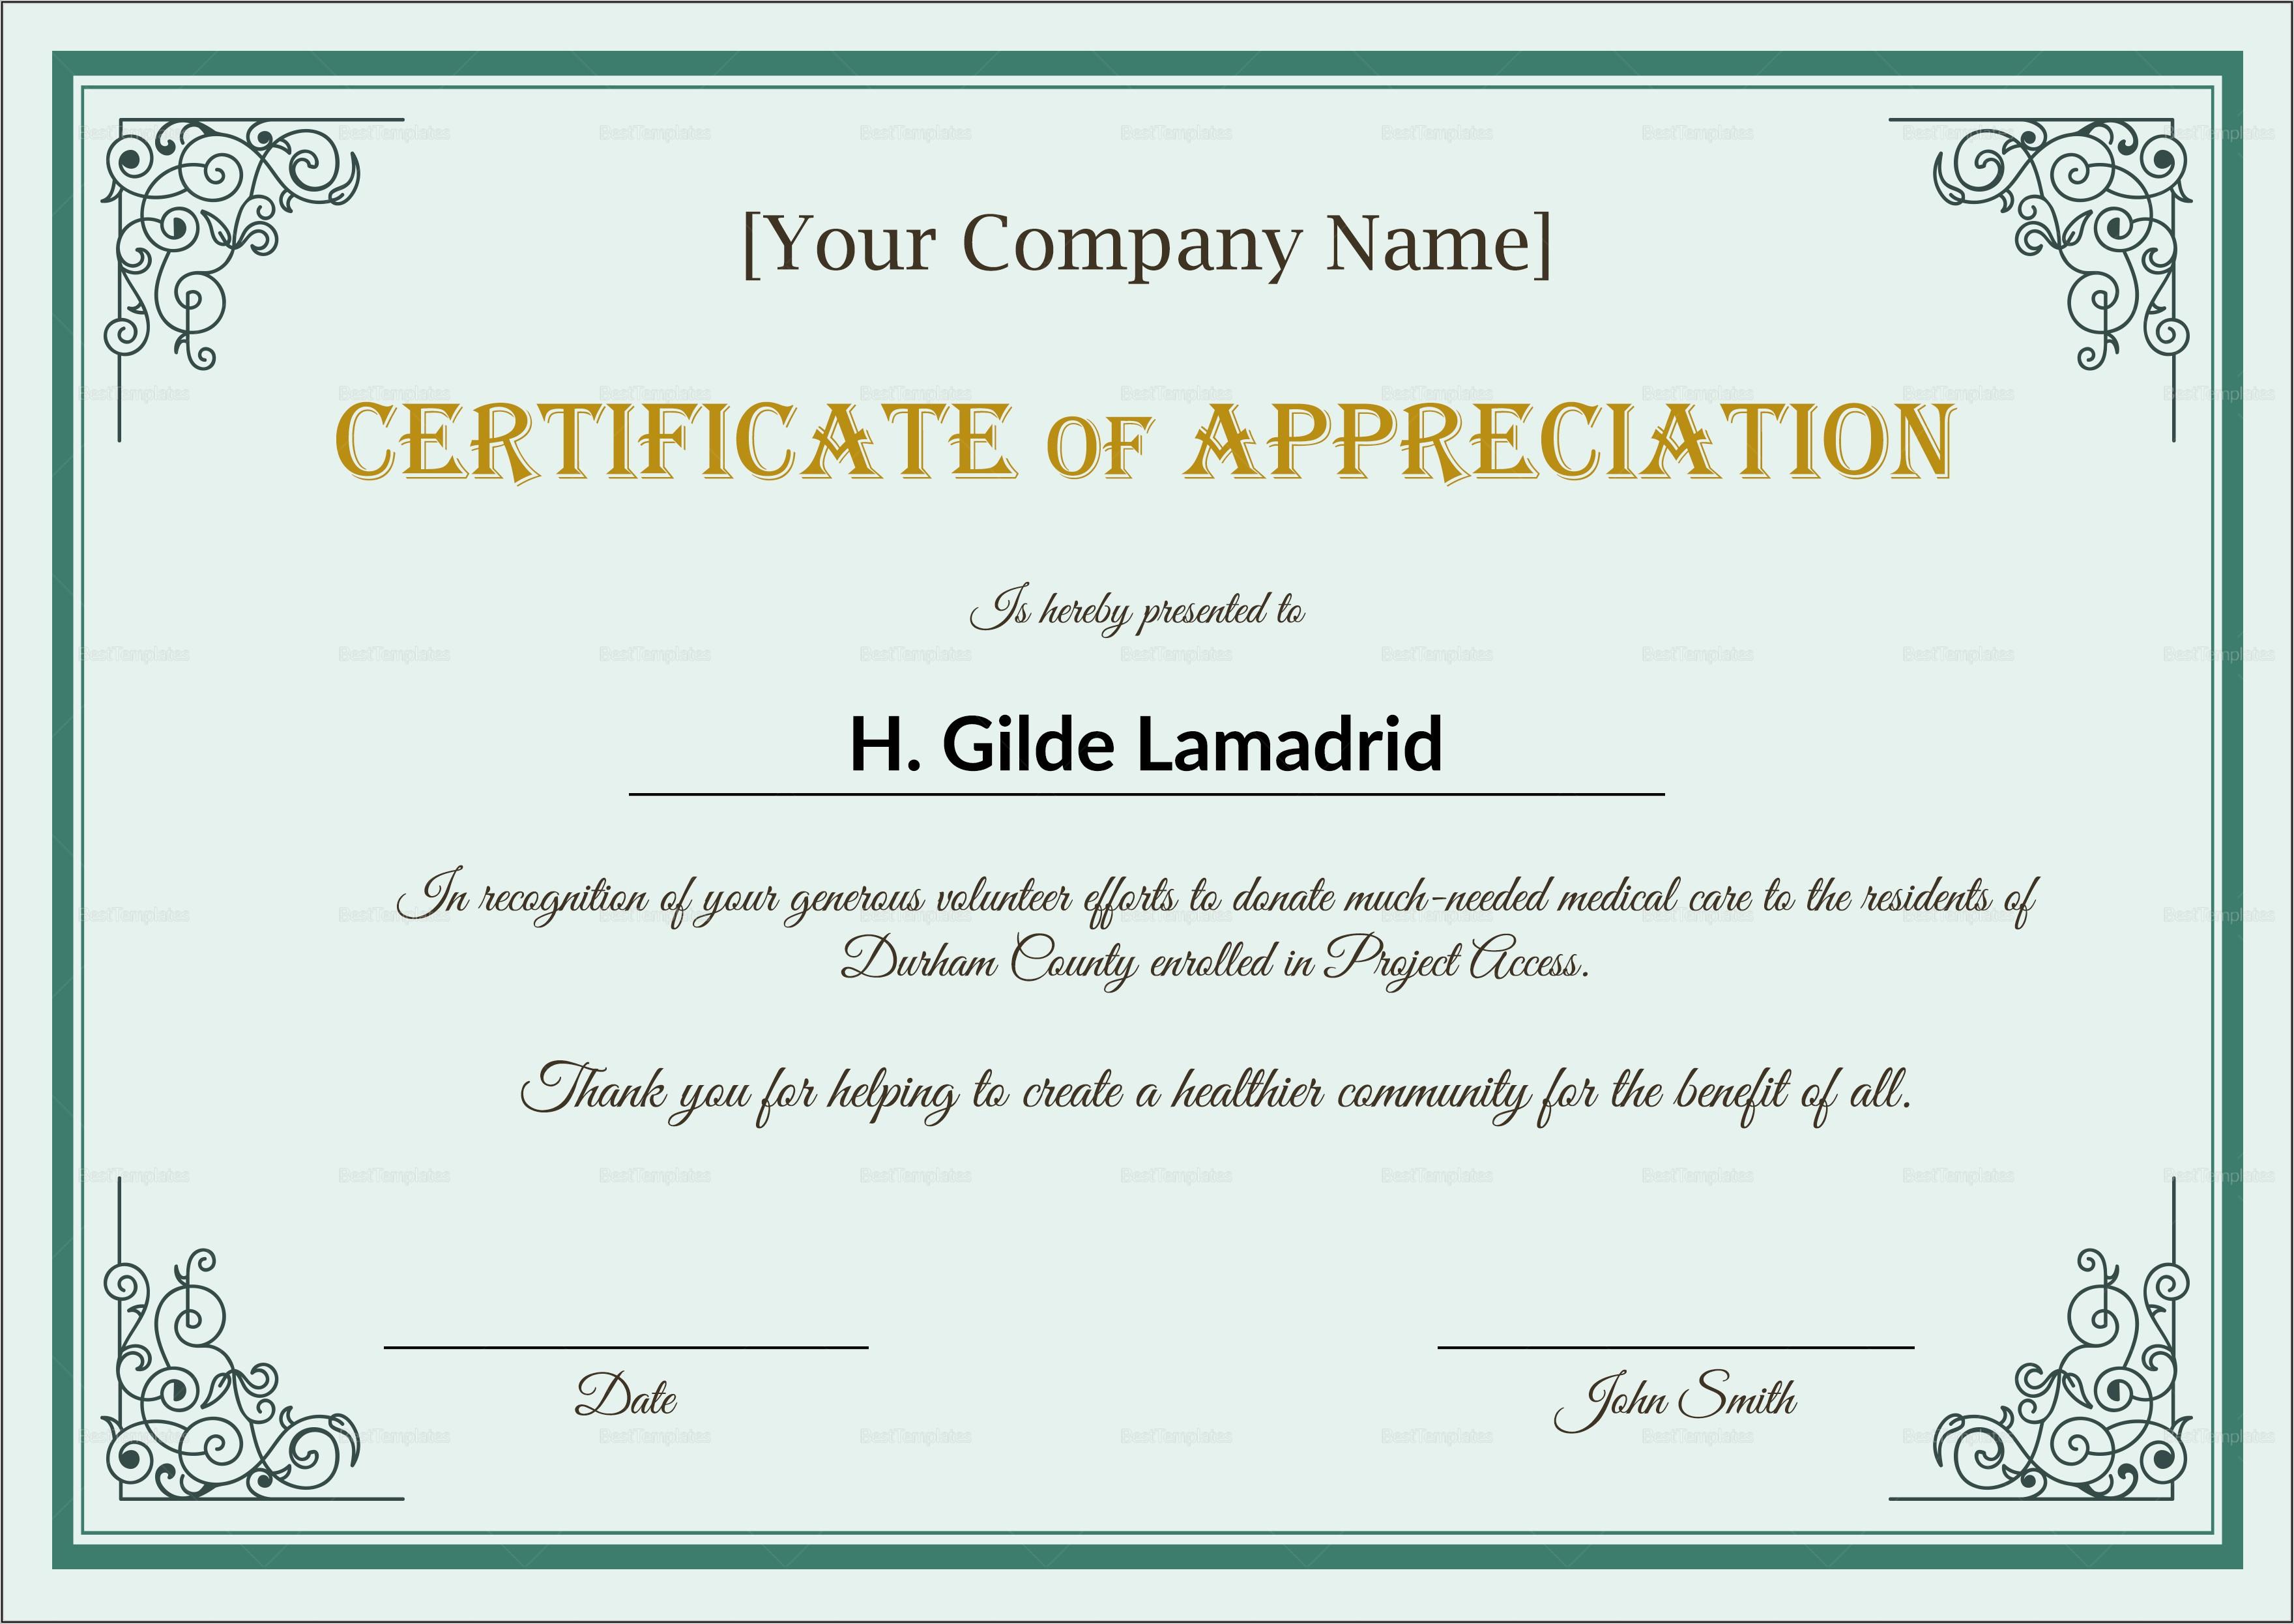 Employee Appreciation Certificate Word Template